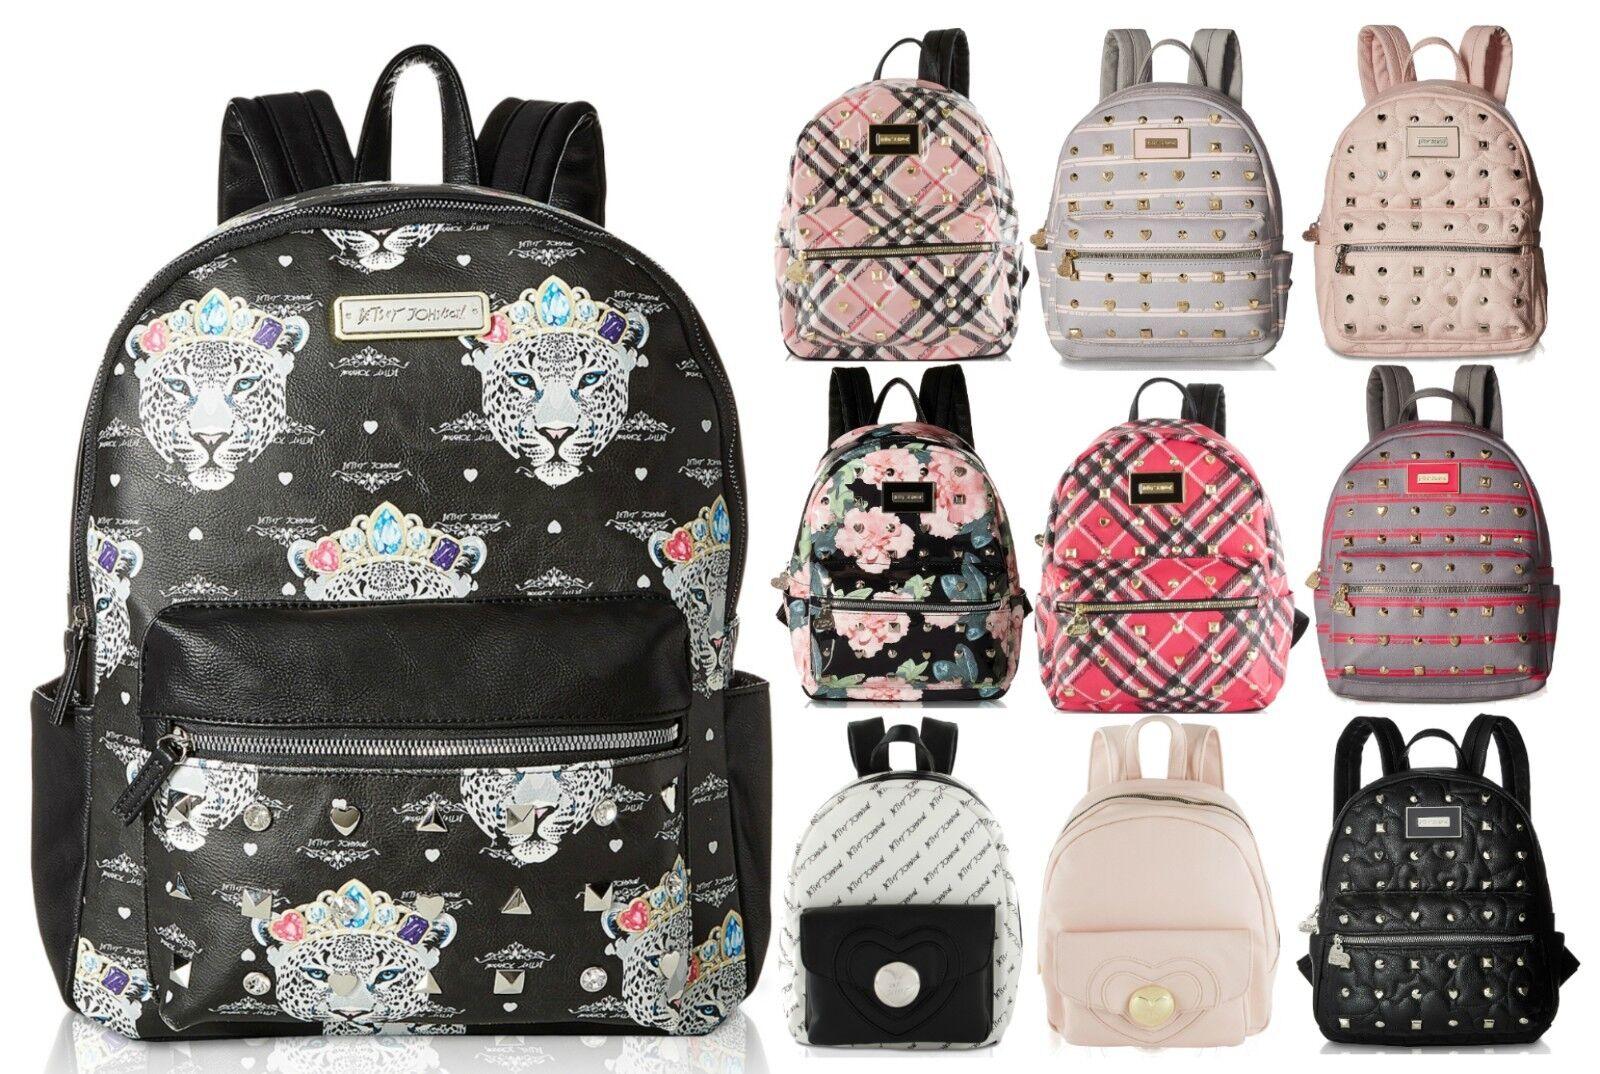 Betsey Johnson Kitsch Stud Medium Travel Luggage Backpack Pu